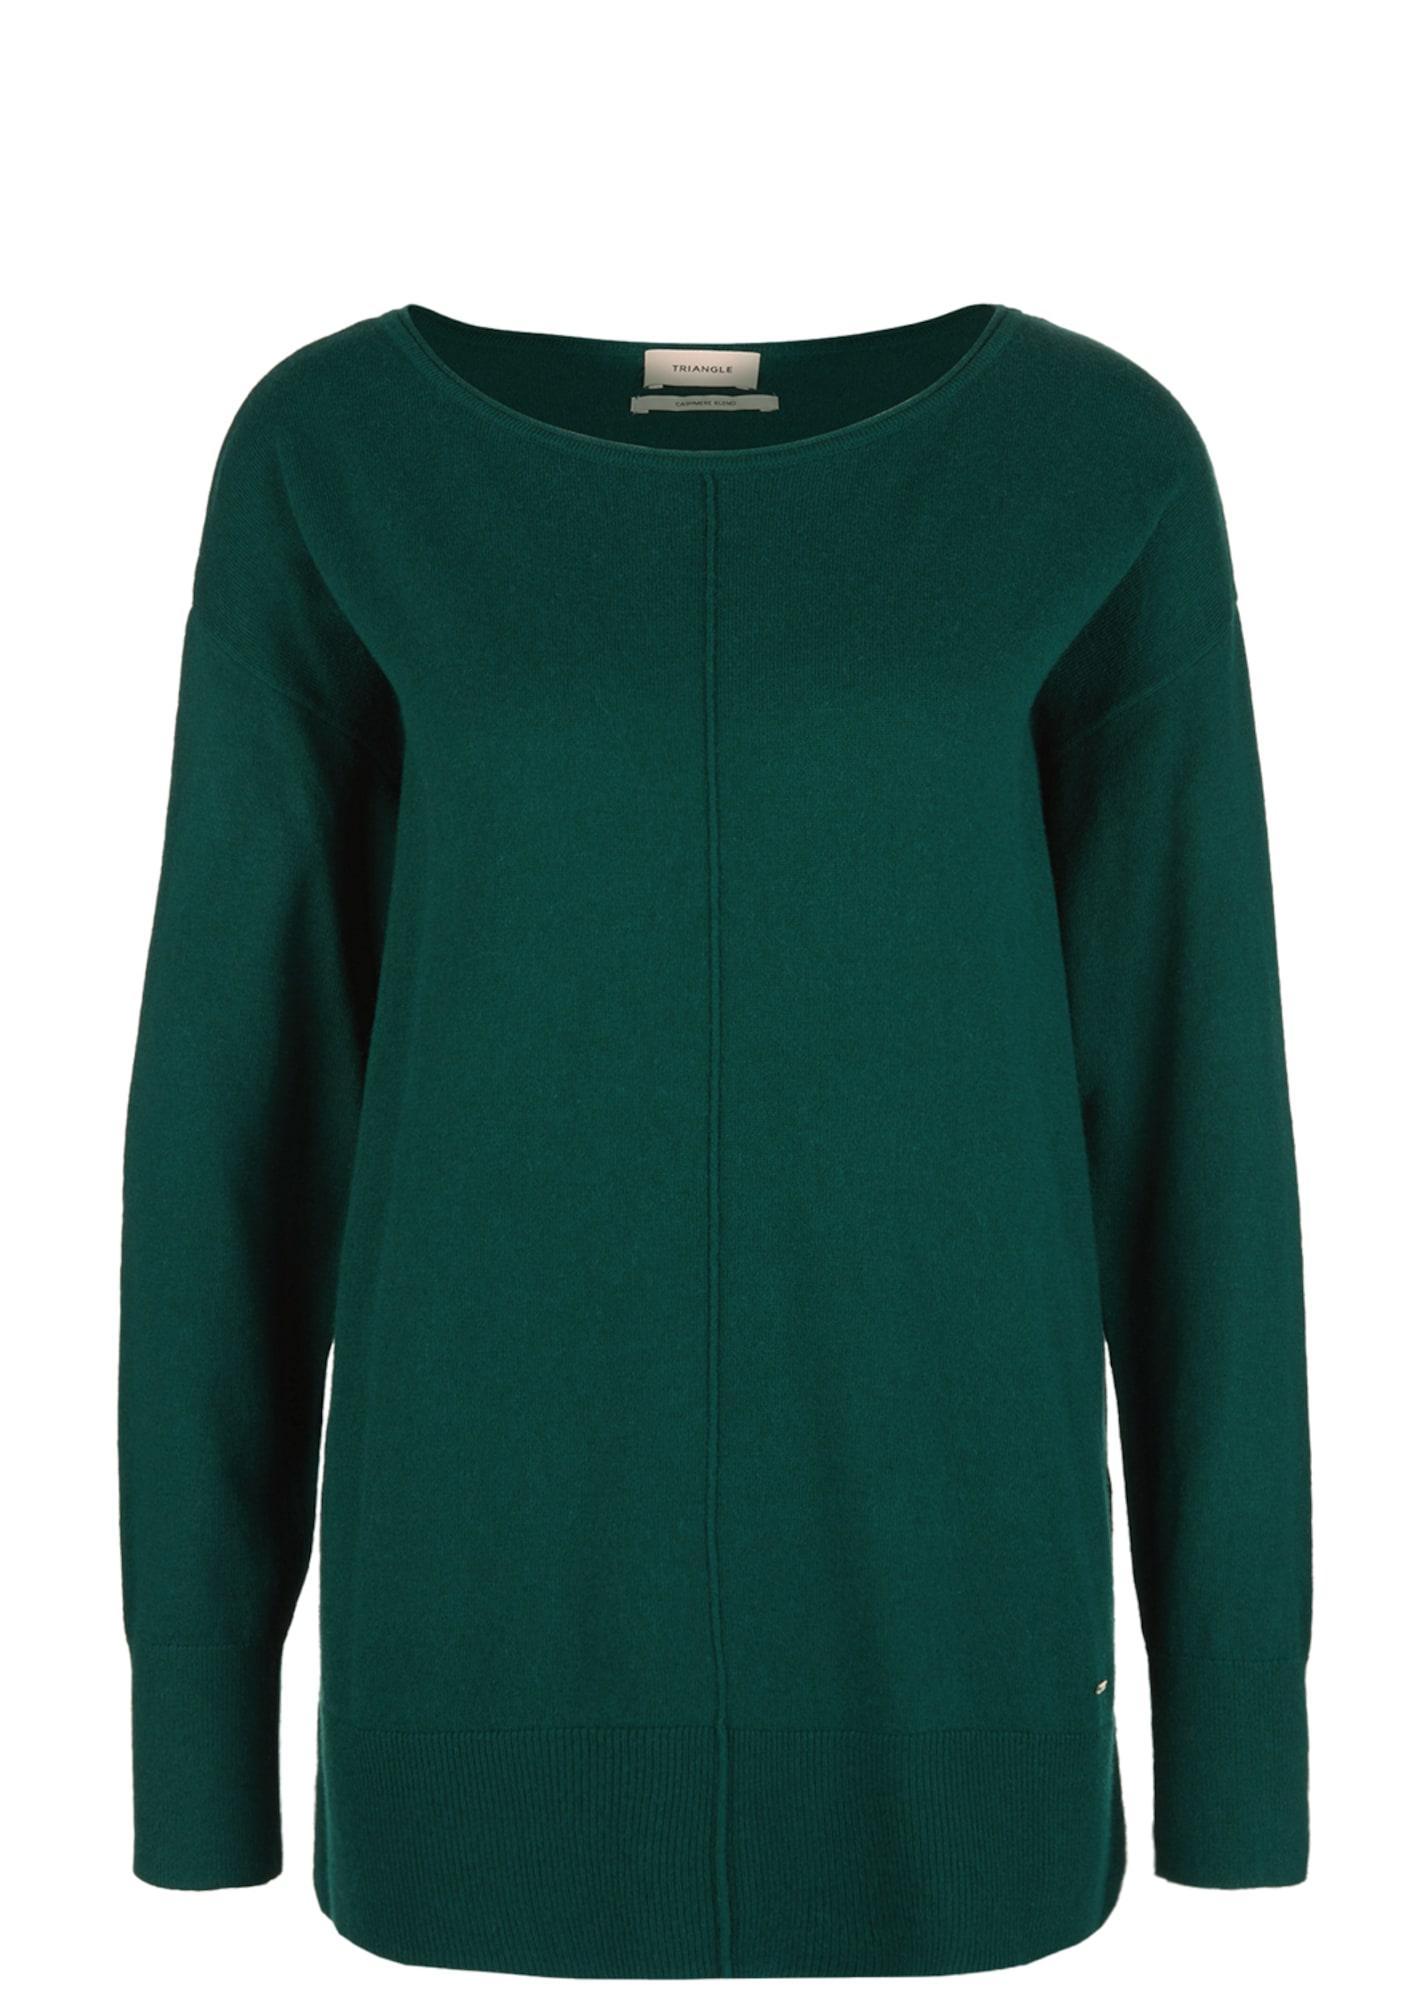 Pullover | Bekleidung > Pullover | Dunkelgrün | Triangle